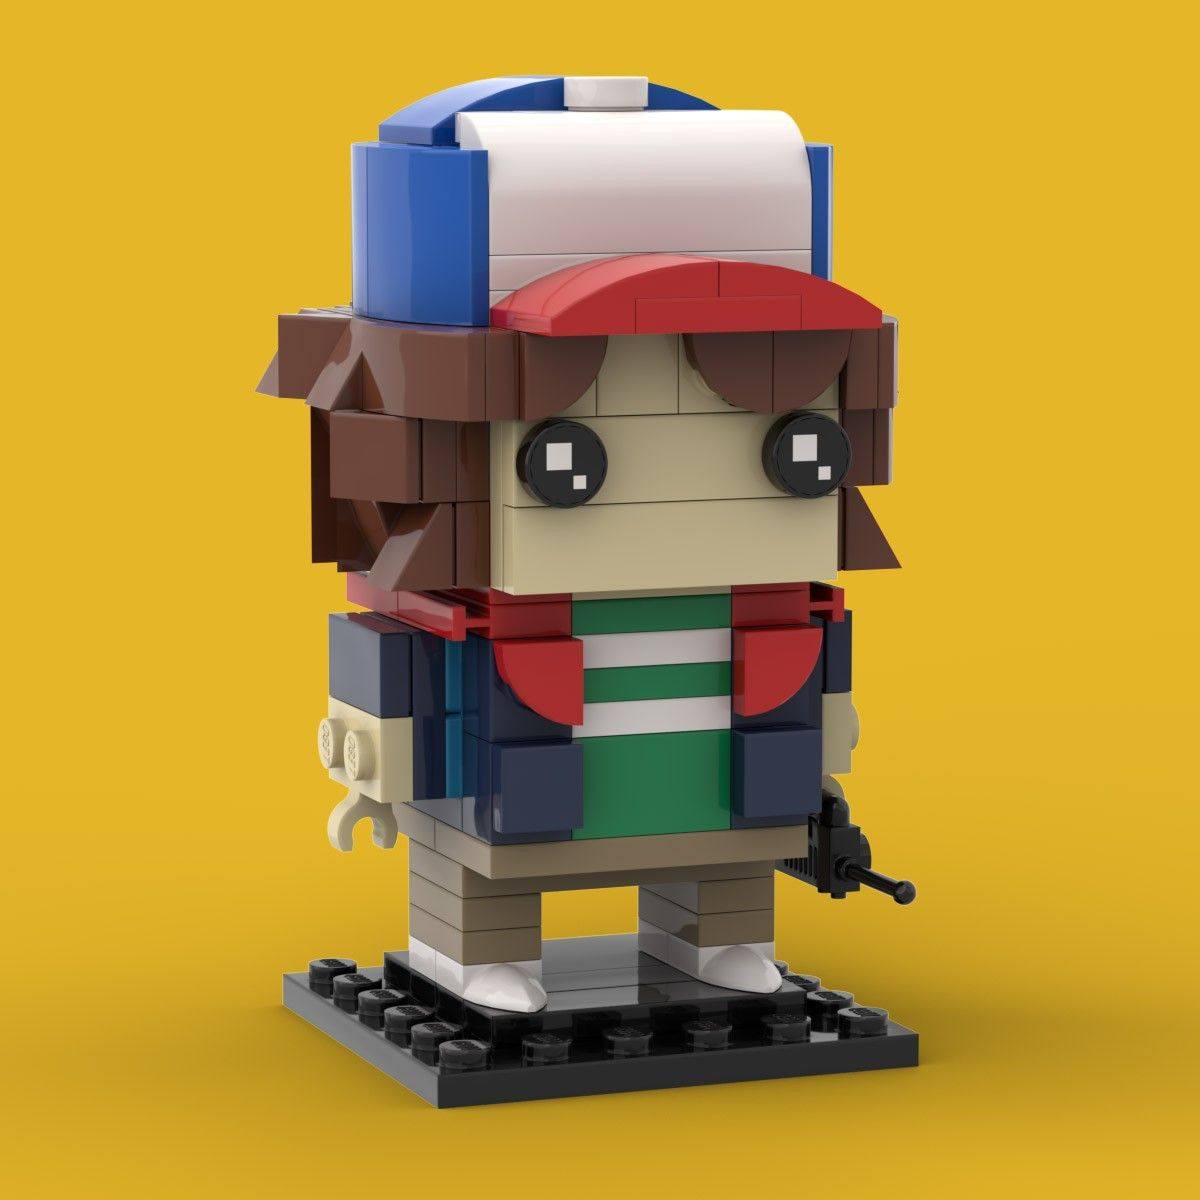 Lego Brickheadz Stinky Pete Toy Story 2 MOC Creation PDF INSTRUCTIONS ONLY